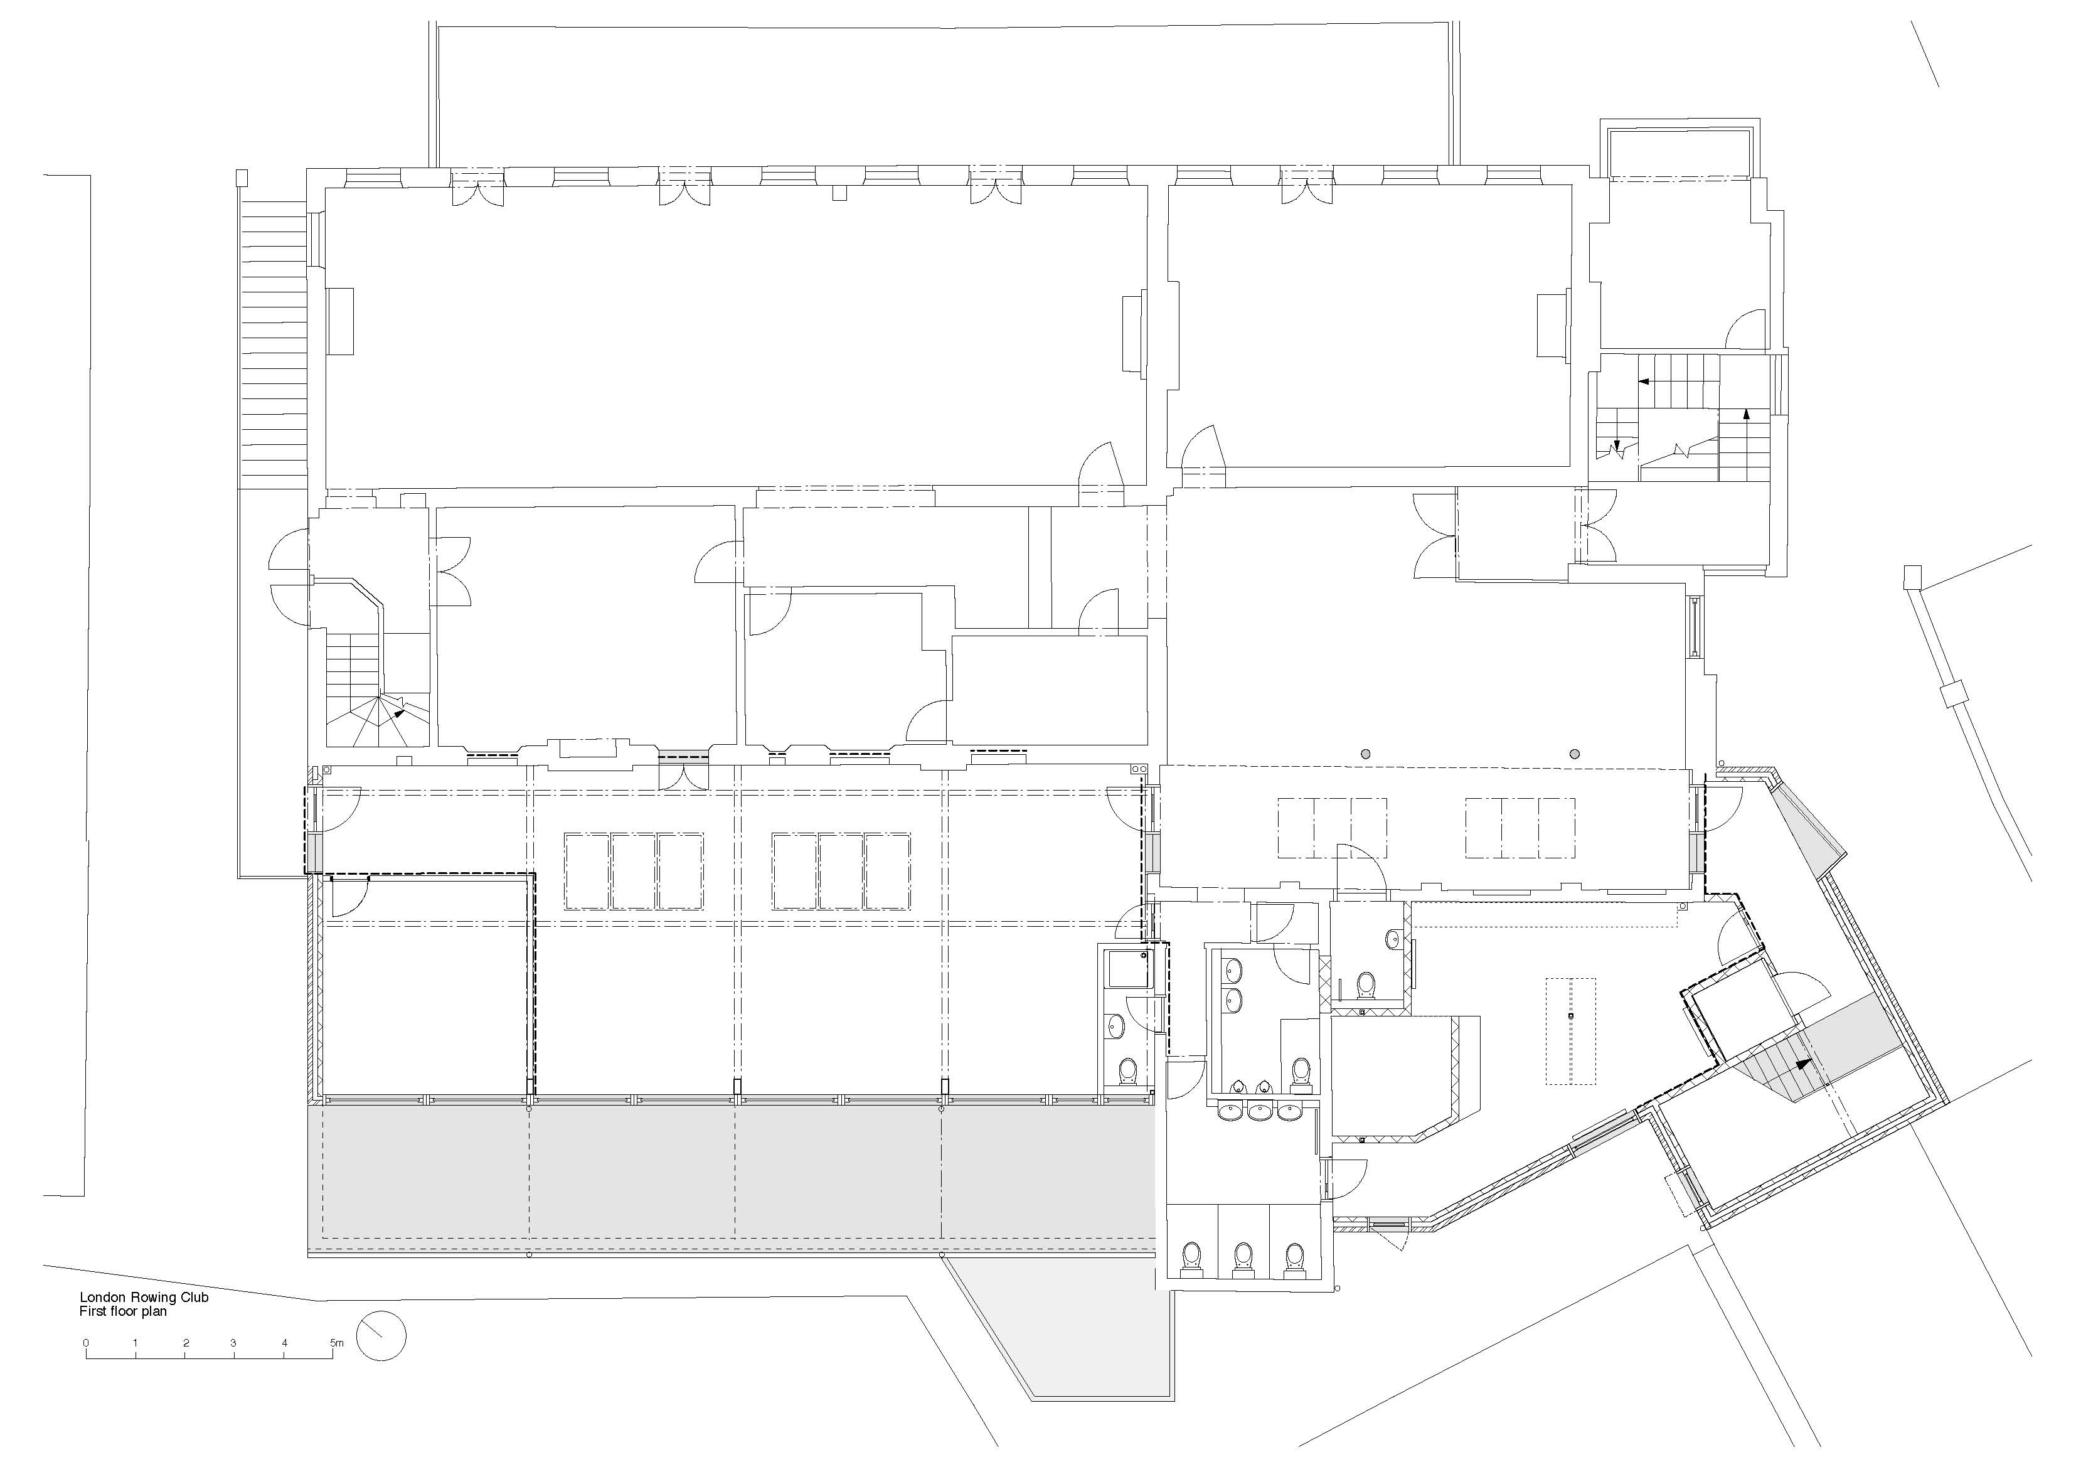 London Rowing Club first floor plan